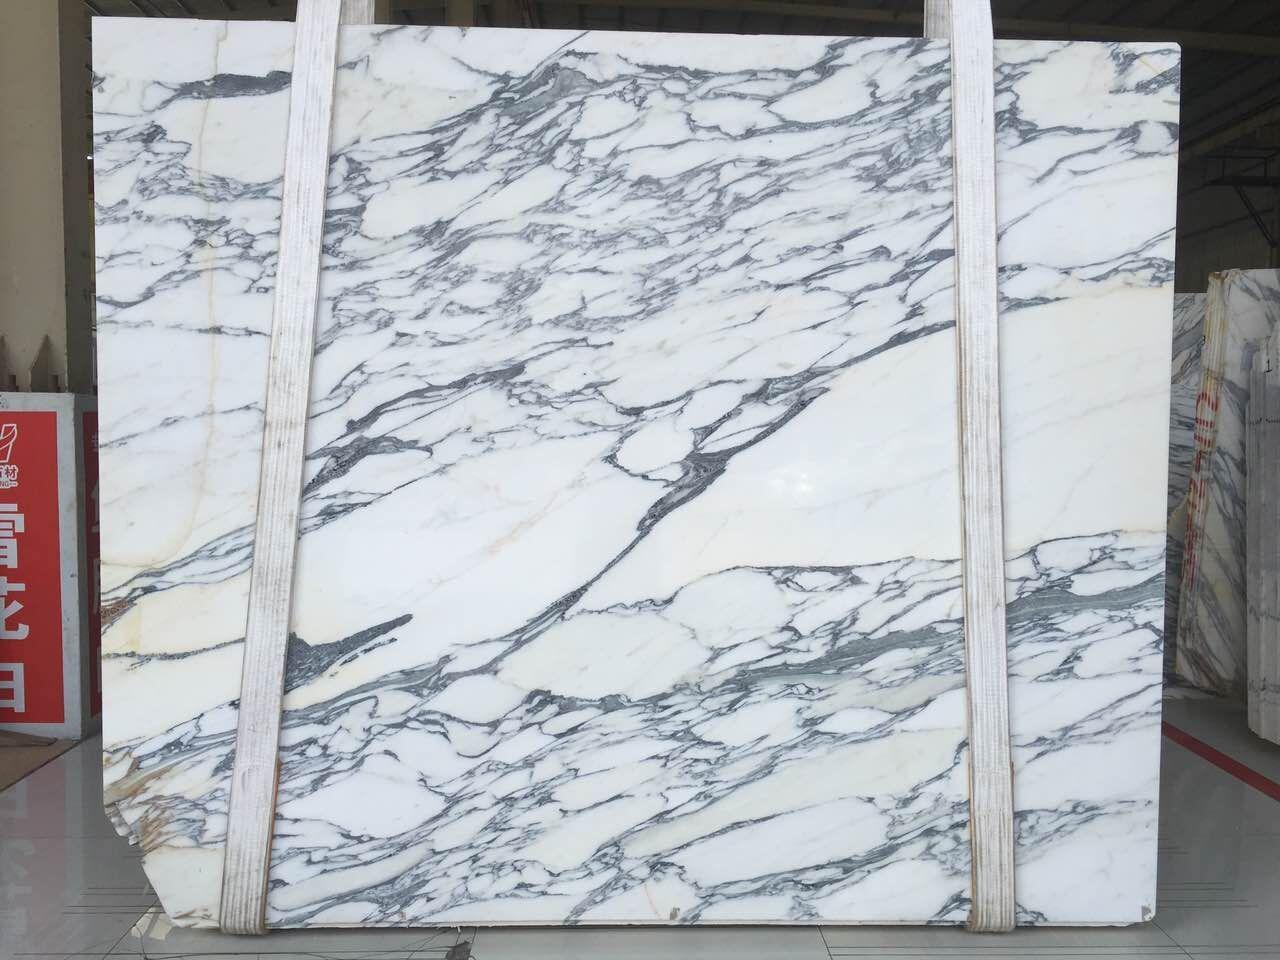 Arabescato Marble Slabs Shenzhen Leeste Industry Co Ltd Natural Stone Supplier Www Chinagranitemart Com Arabescato Marble Statuario Marble Marble Slab